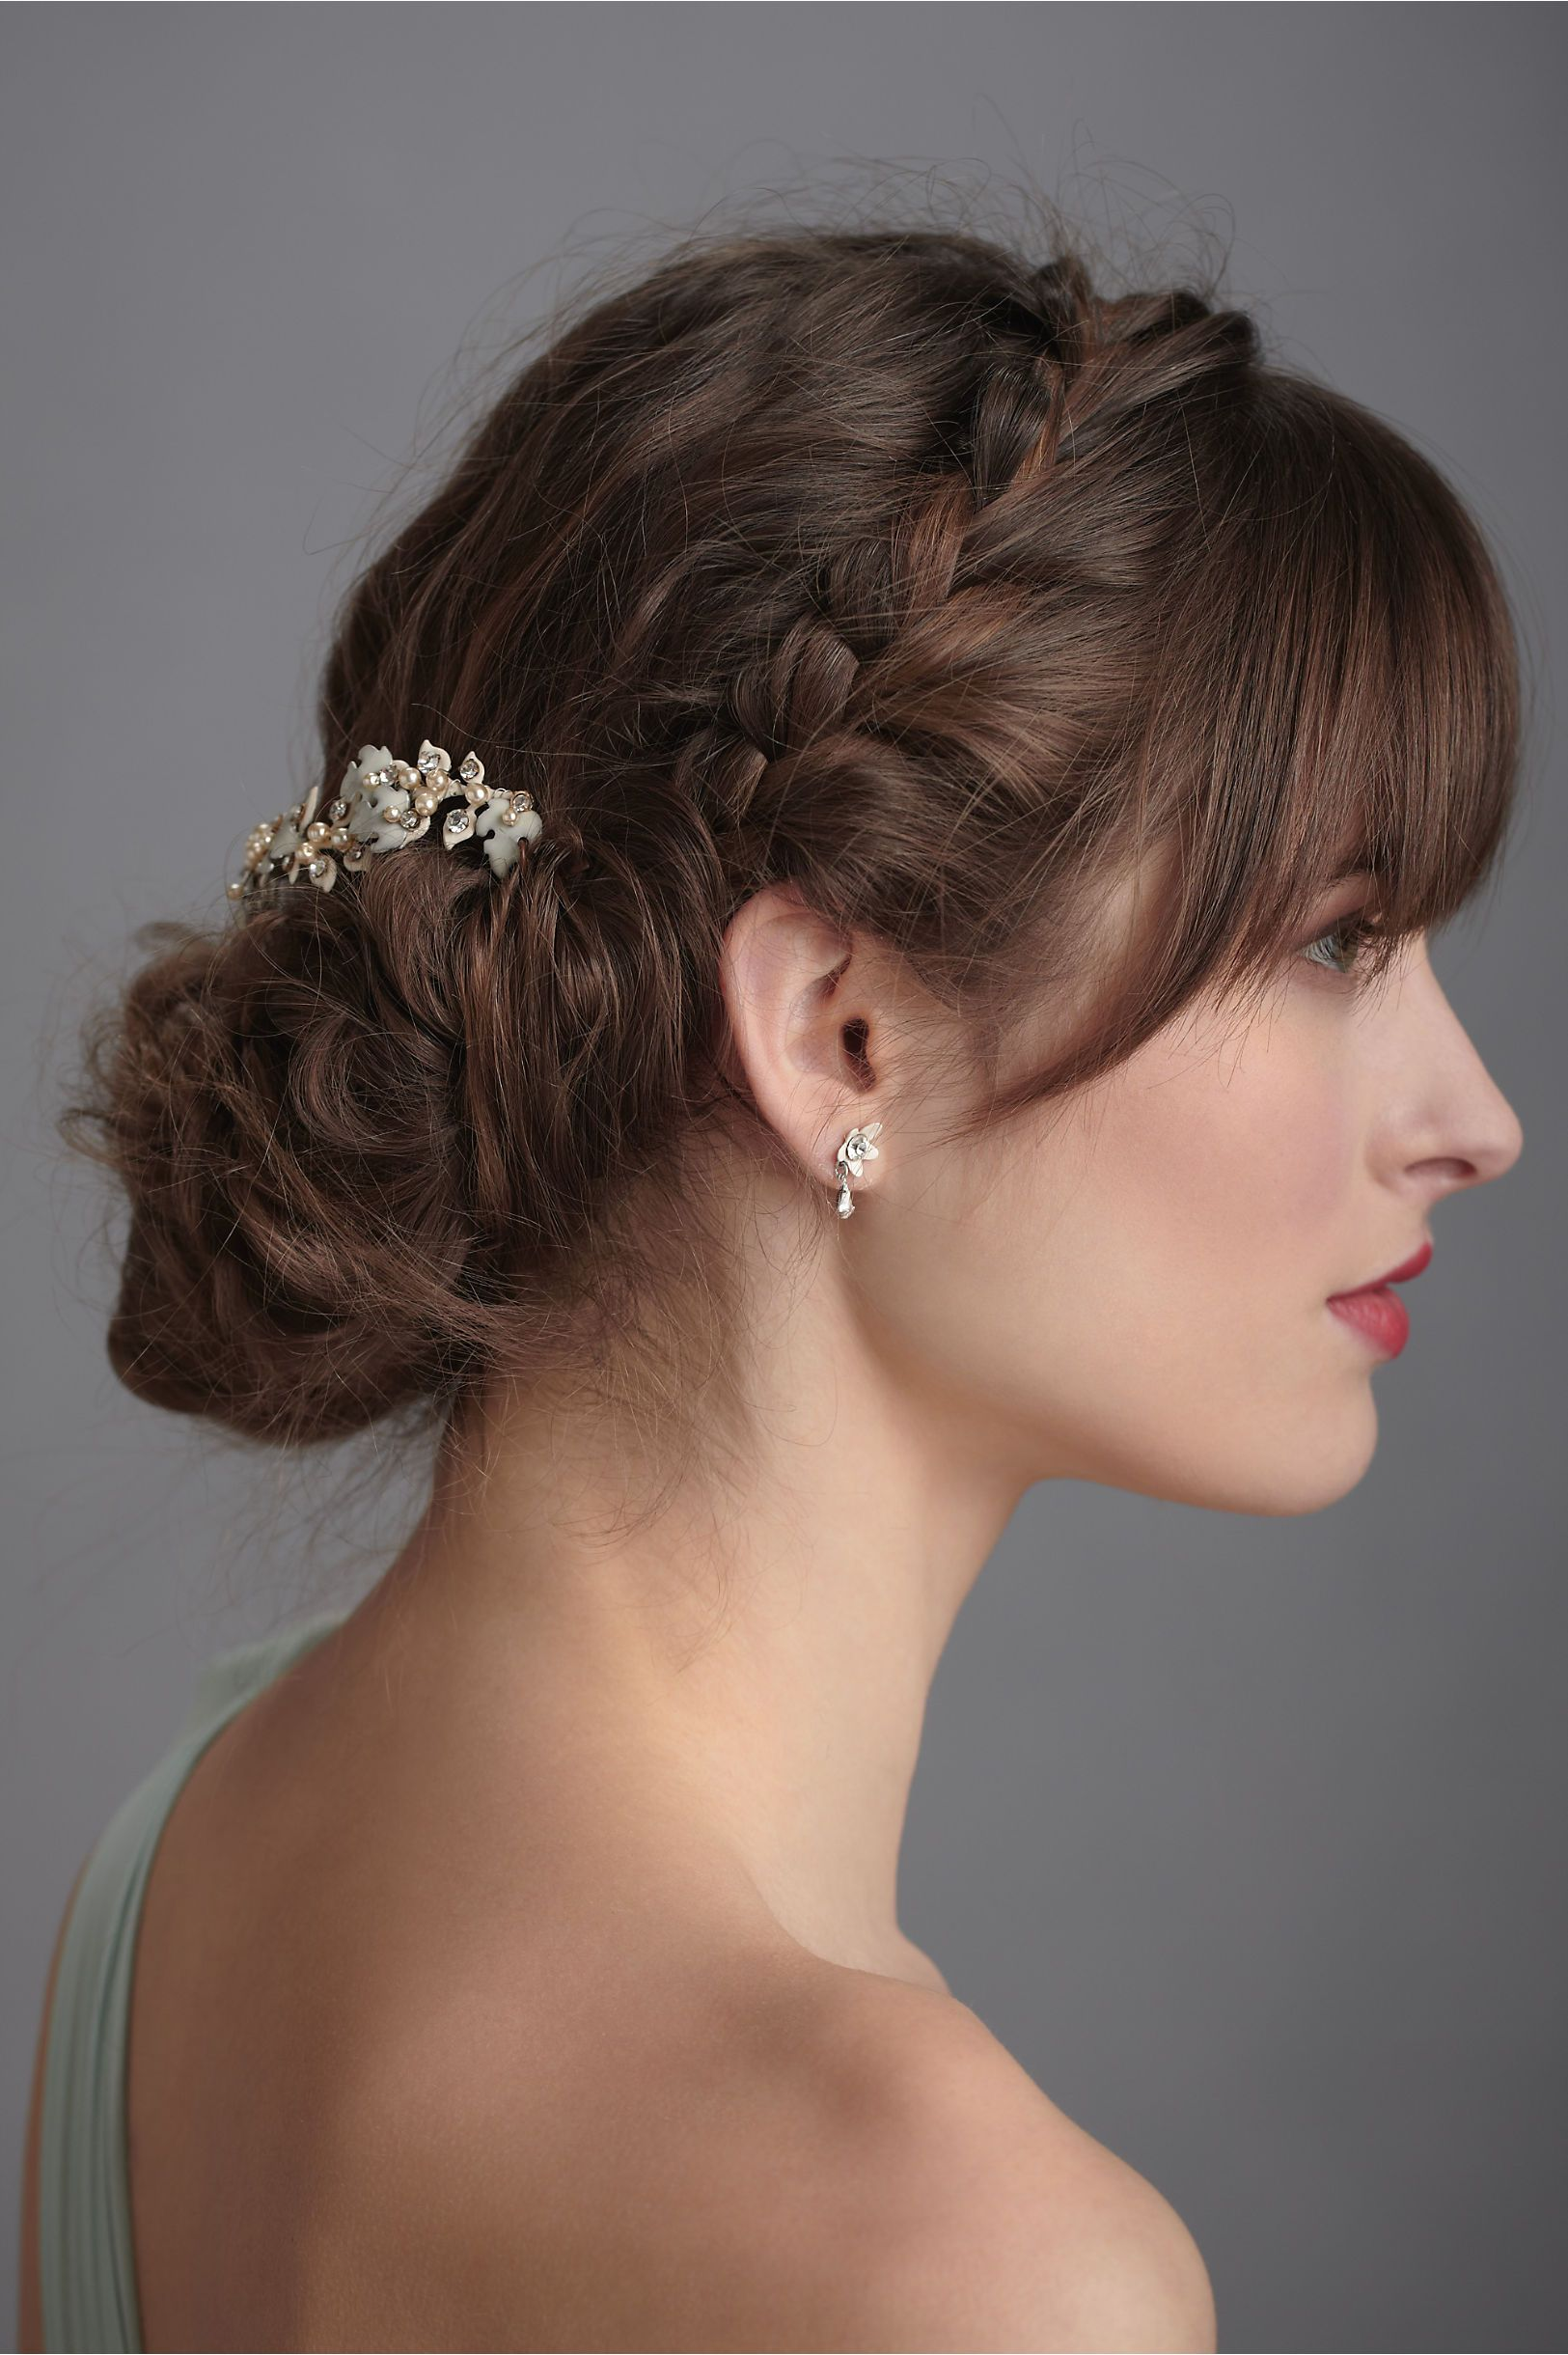 Sensacional peinados novia recogidos bajos Galeria De Cortes De Pelo Tendencias - moño bajo con trenza lateral | Peinados | Pinterest ...